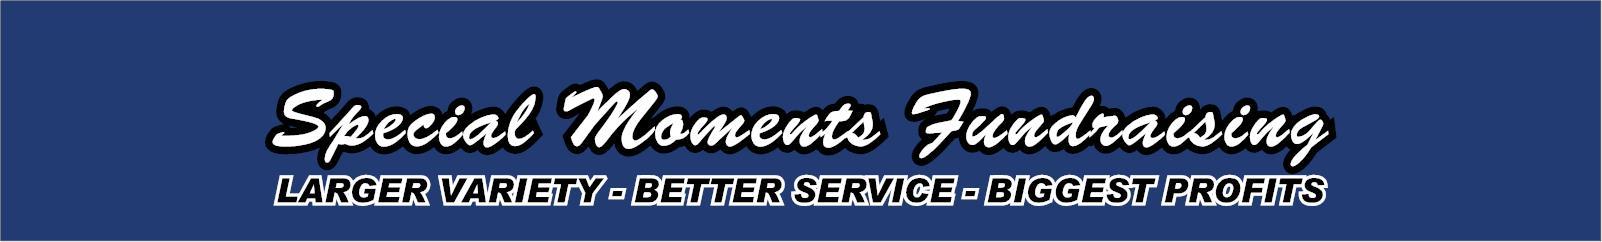 NEW Logo4 1600 Width